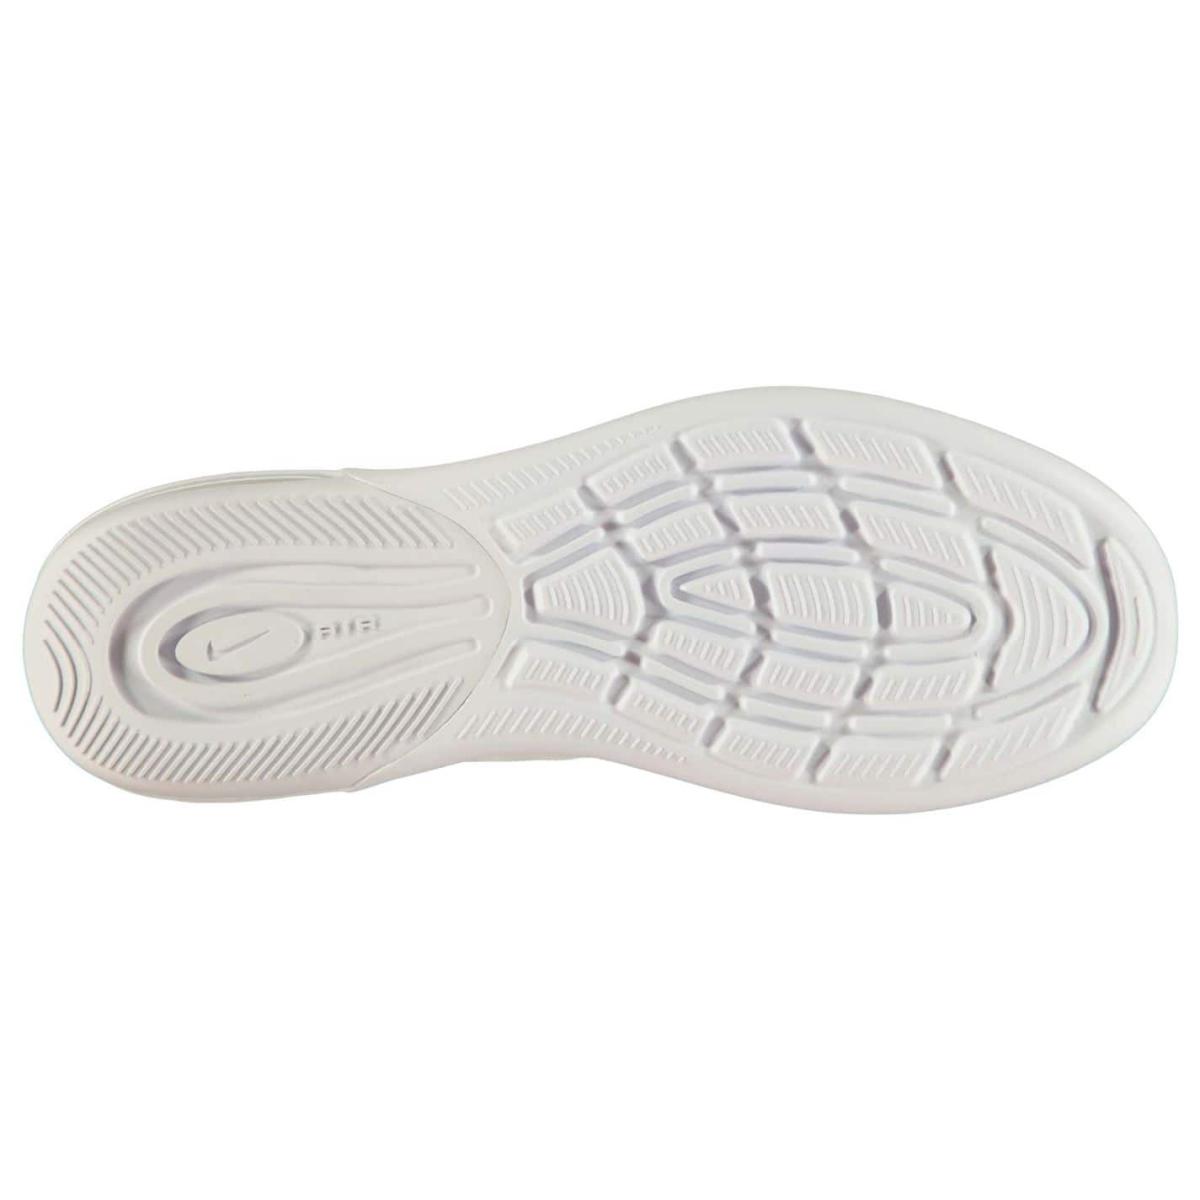 NIKE-Air-Max-Axis-Scarpe-da-ginnastica-Scarpe-da-Corsa-Uomo-Sneaker-Scarpe-Sportive-Fitness-1313 miniatura 38